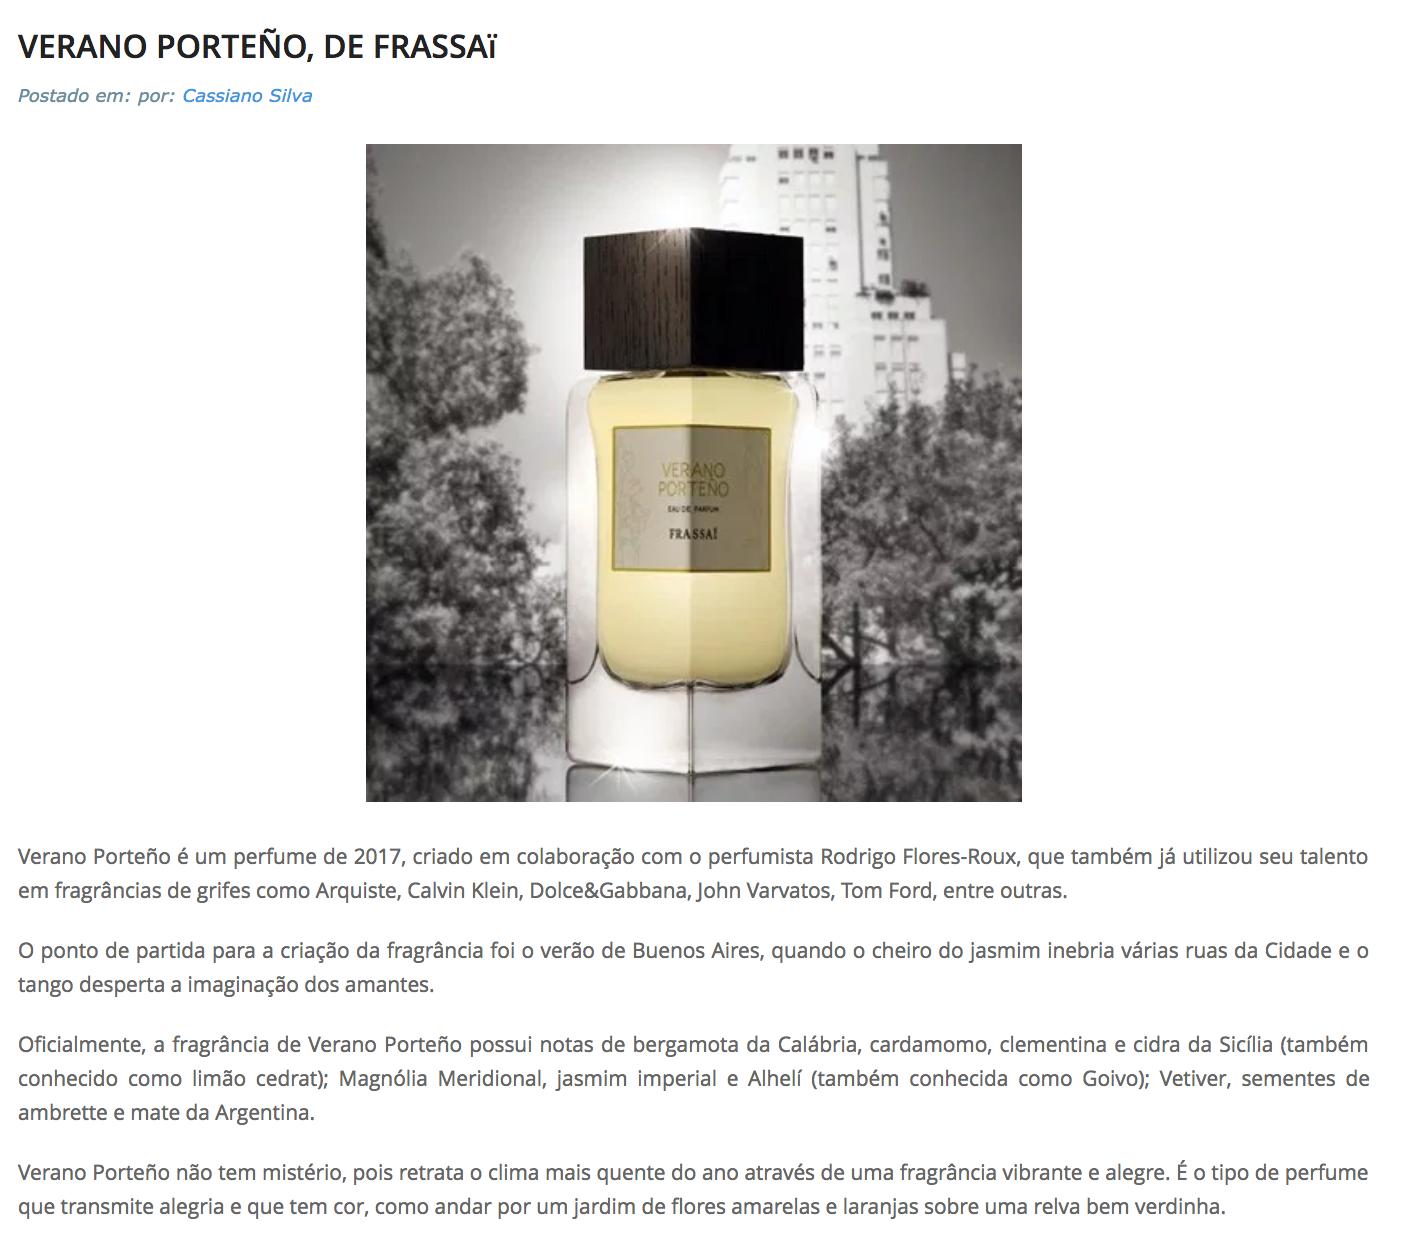 Frassai Verano Porteño Perfume review by Perfumart